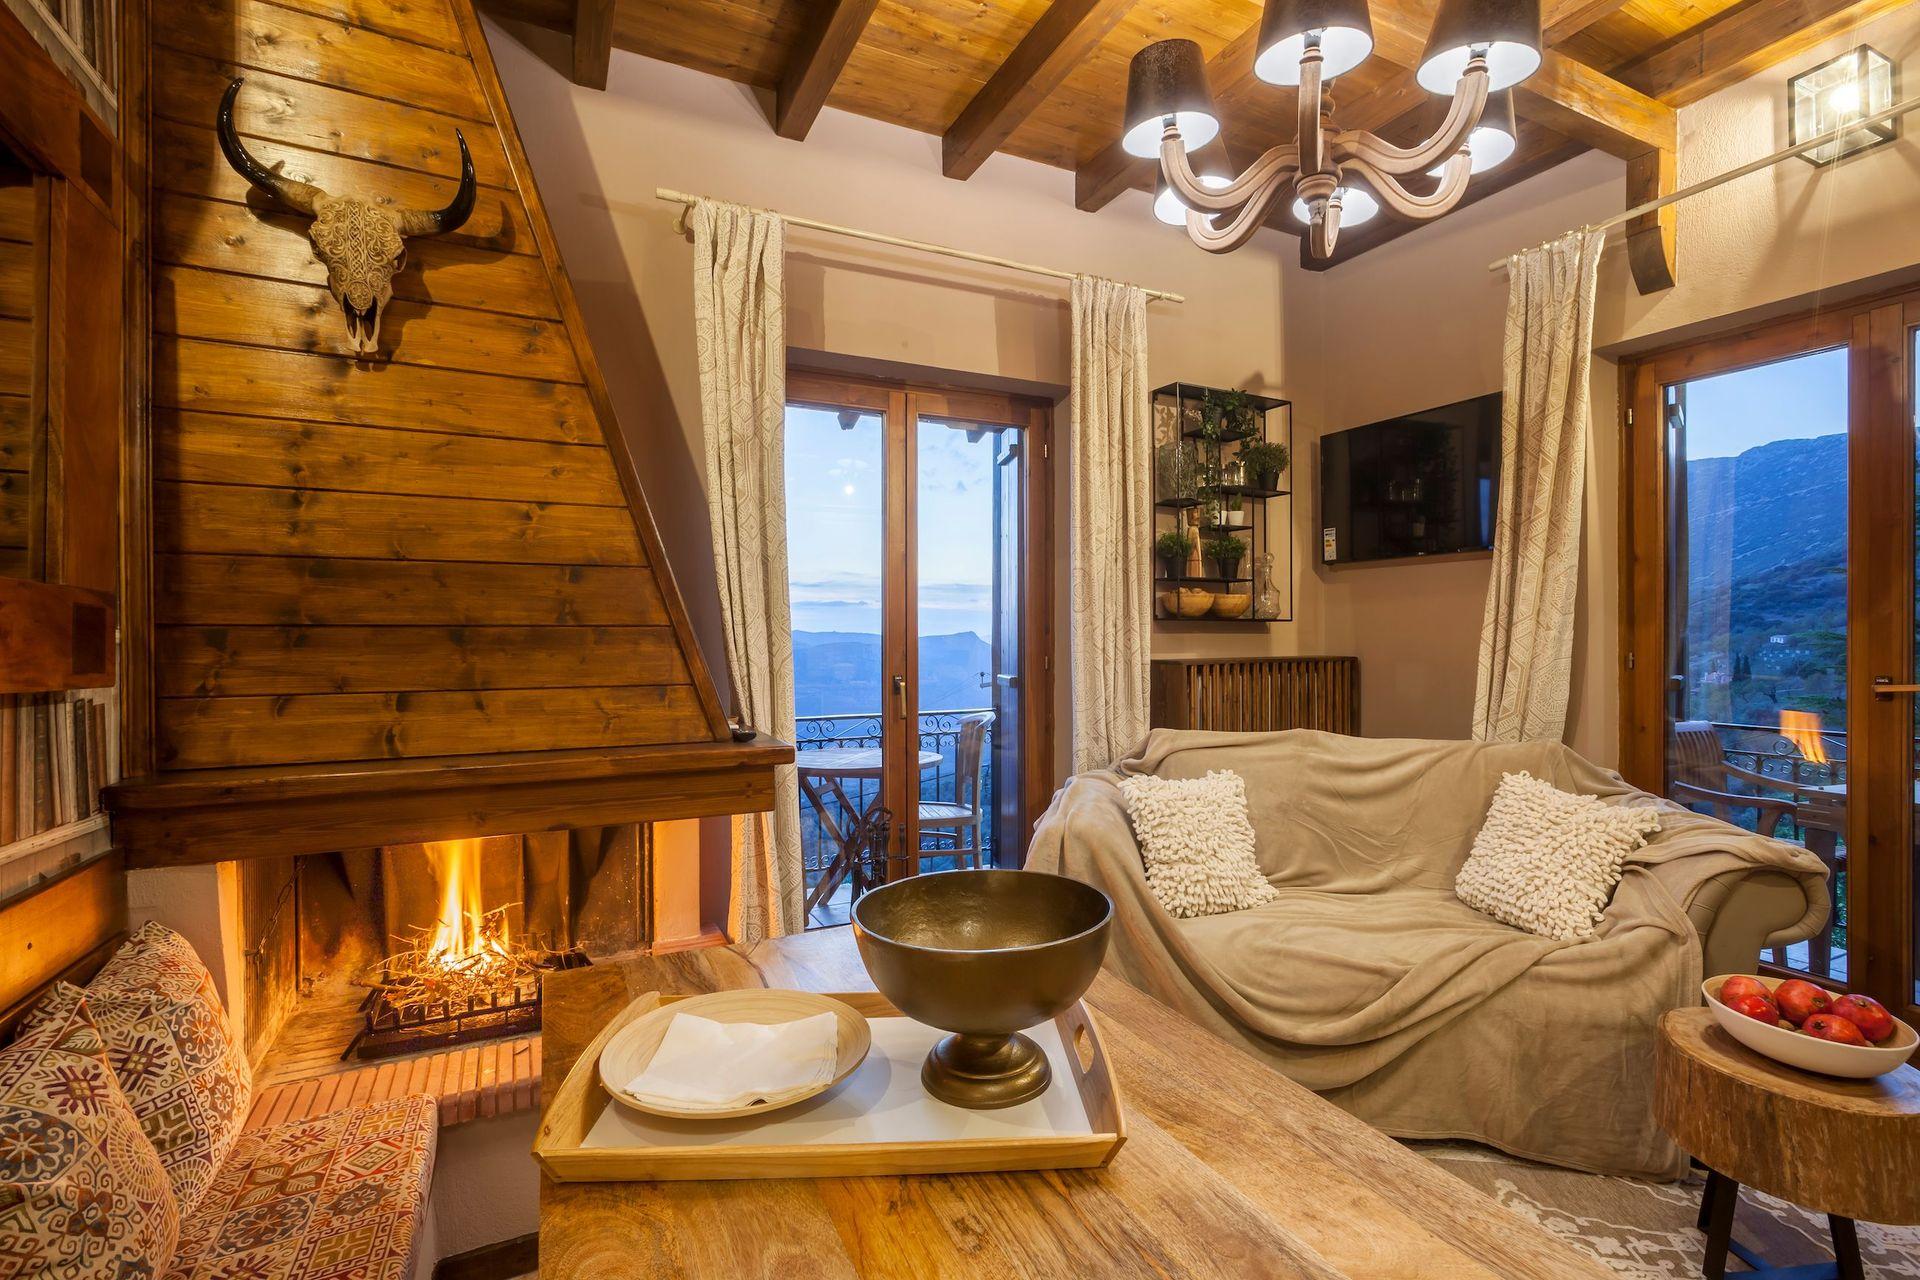 Rock Dandy Mountain House Arachova - Αράχωβα ✦ 5 Ημέρες